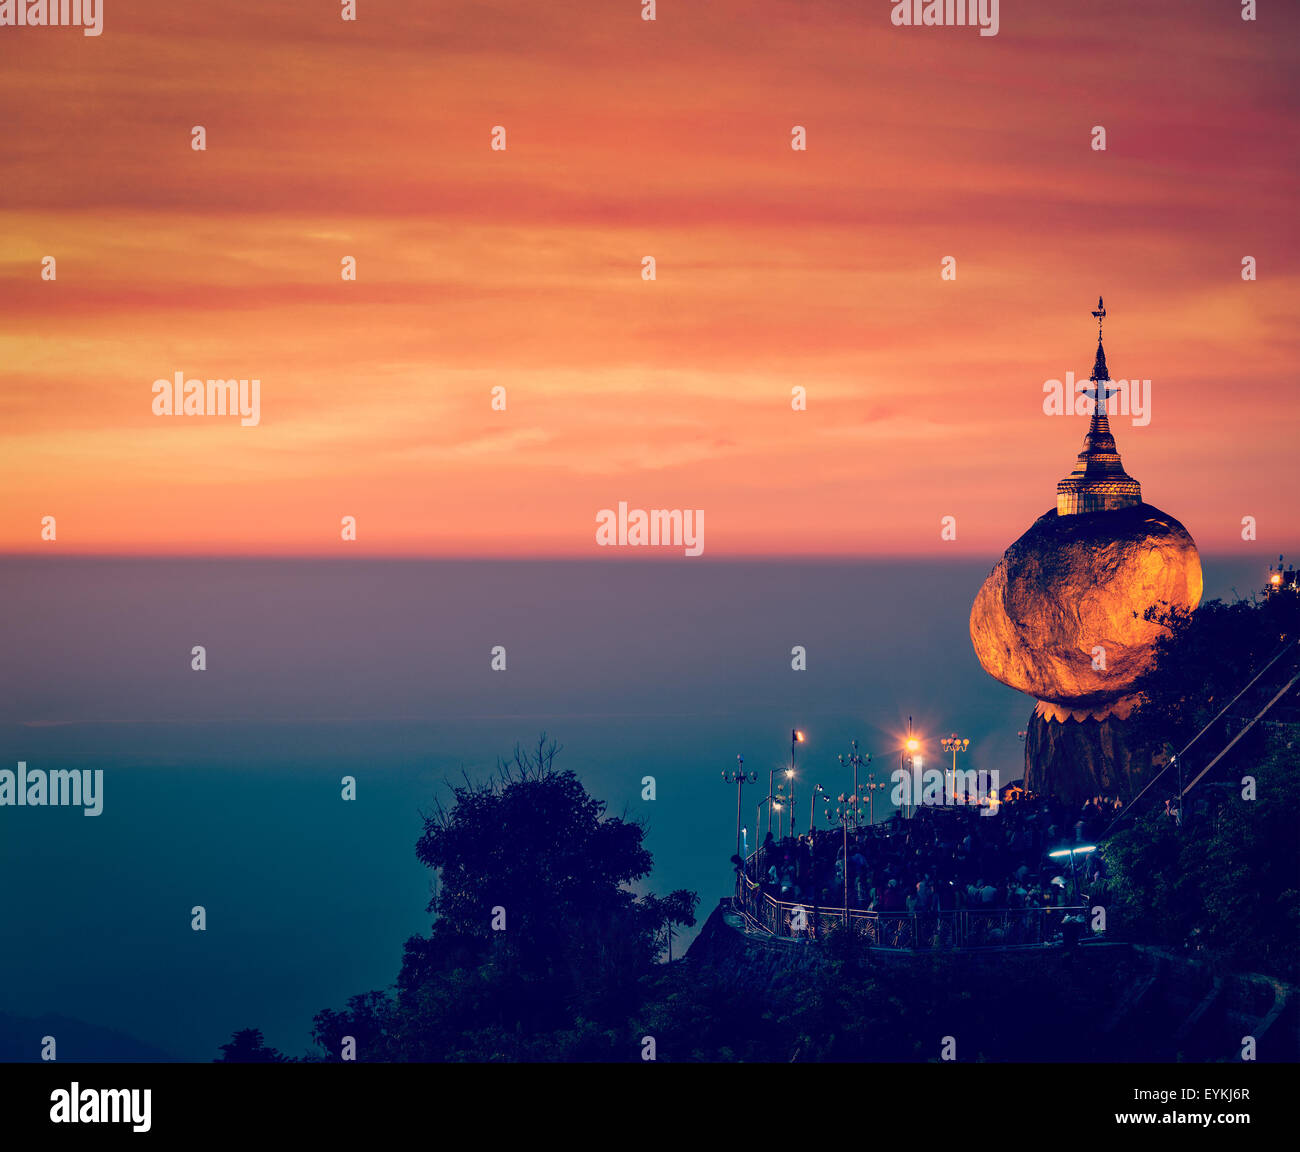 58422f12a2b0 Vintage effetto retrò filtrata hipster style immagine del Golden Rock -  Kyaiktiyo Pagoda - famoso Myanmar